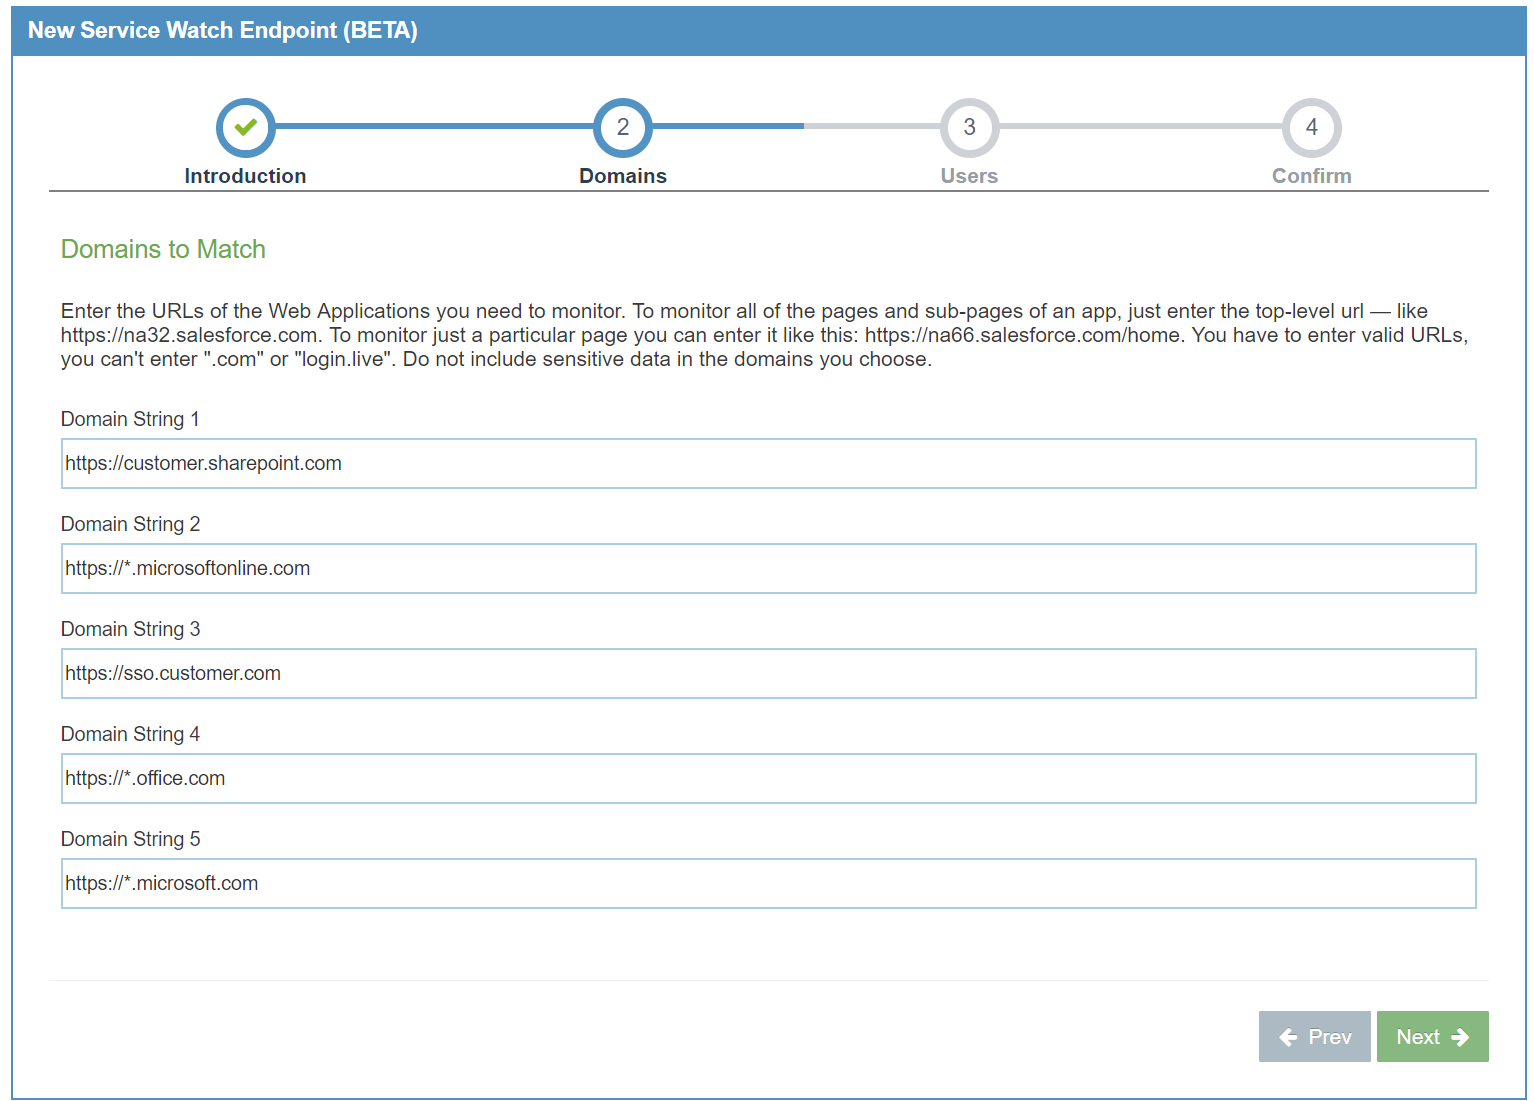 Configure URLs to monitor